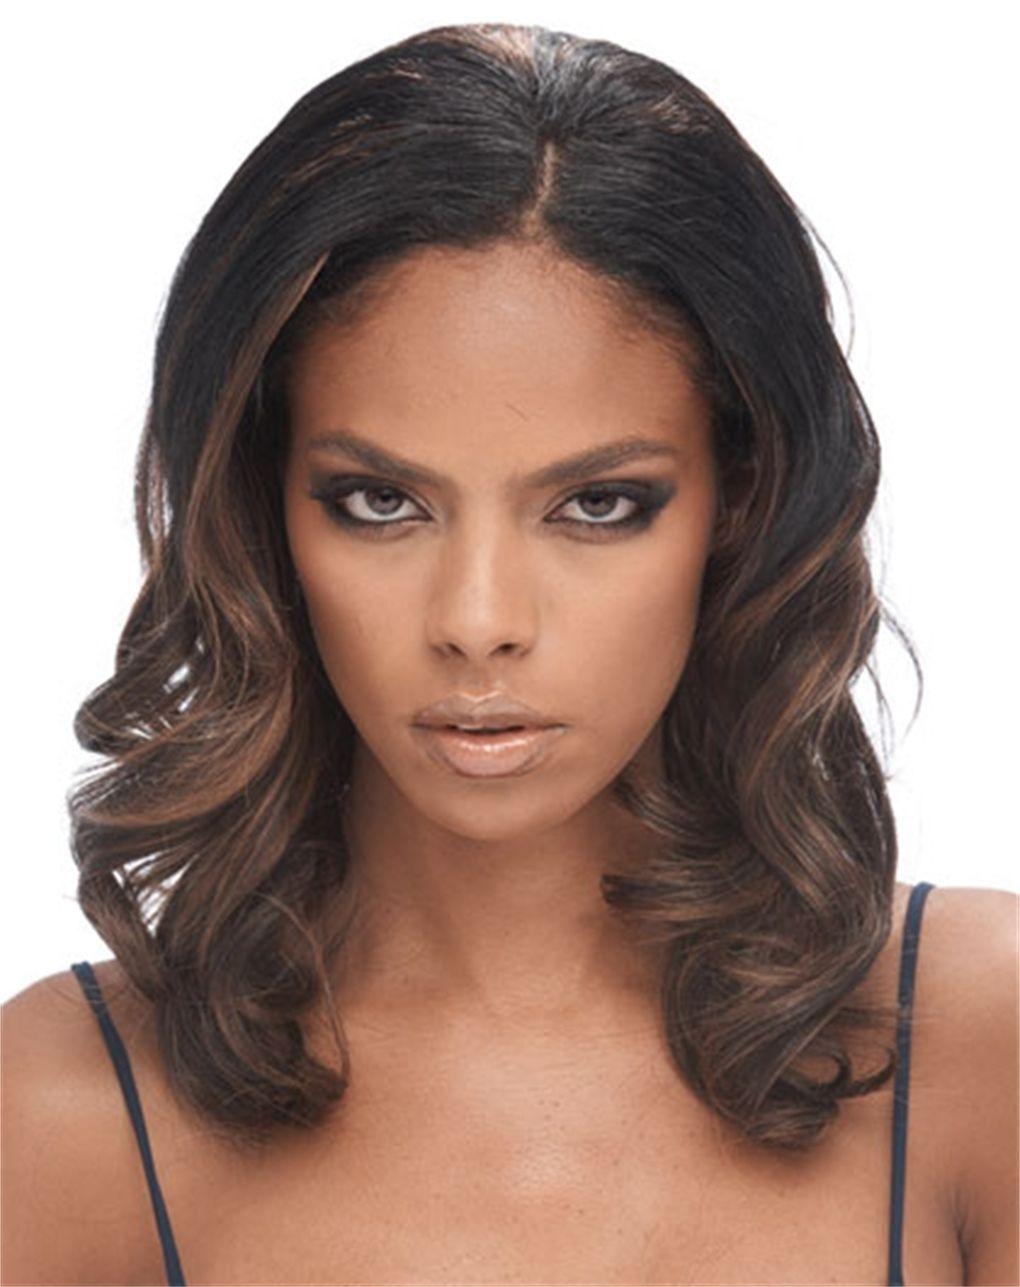 12.99 Femi Model Human Hair Premium Blend Body Wave